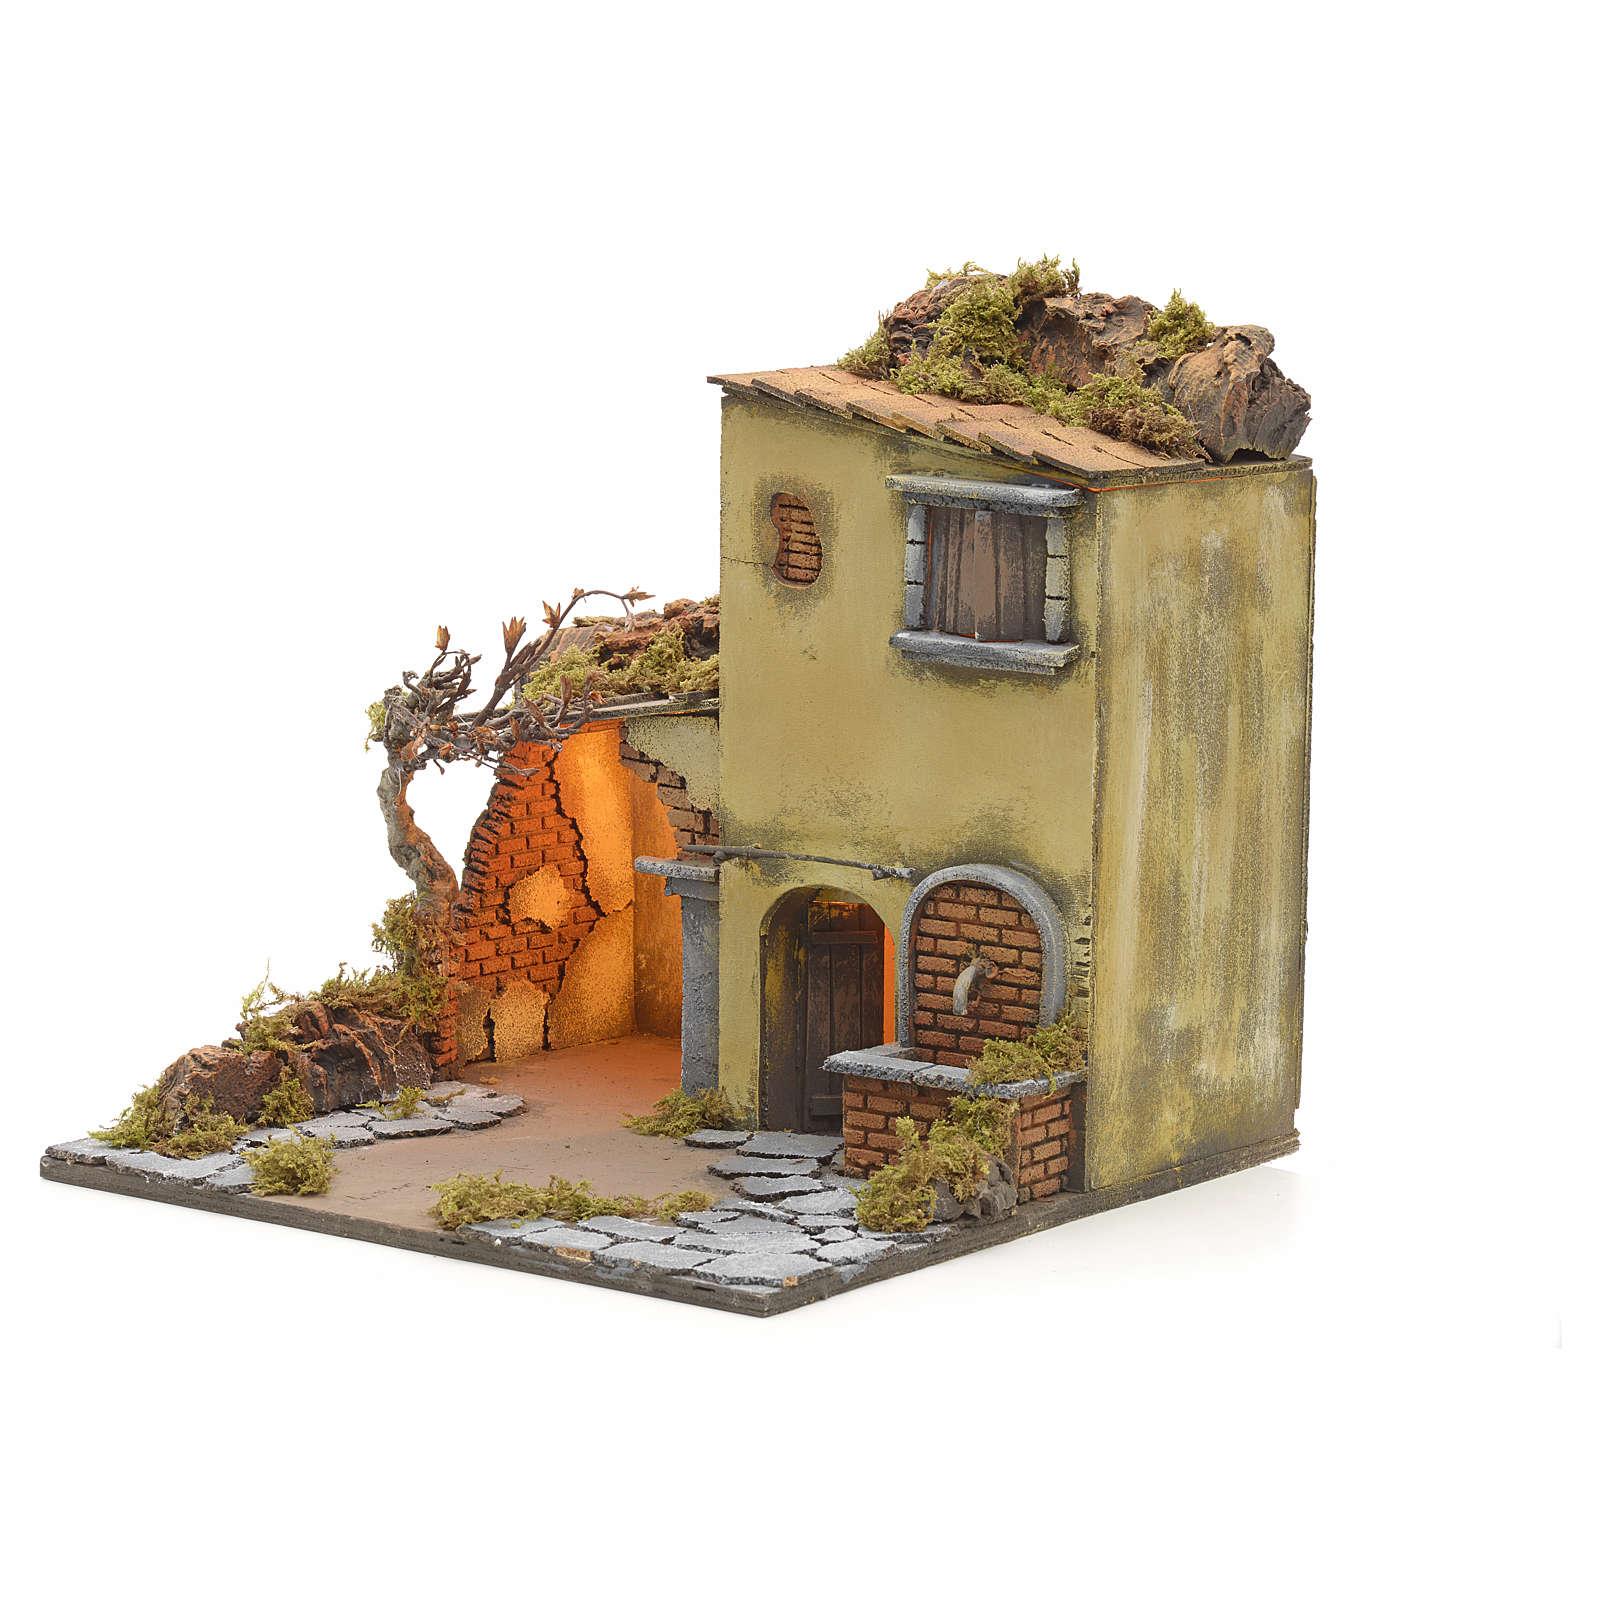 Nativity scene village with fountain, Neapolitan style 40x40x40 4